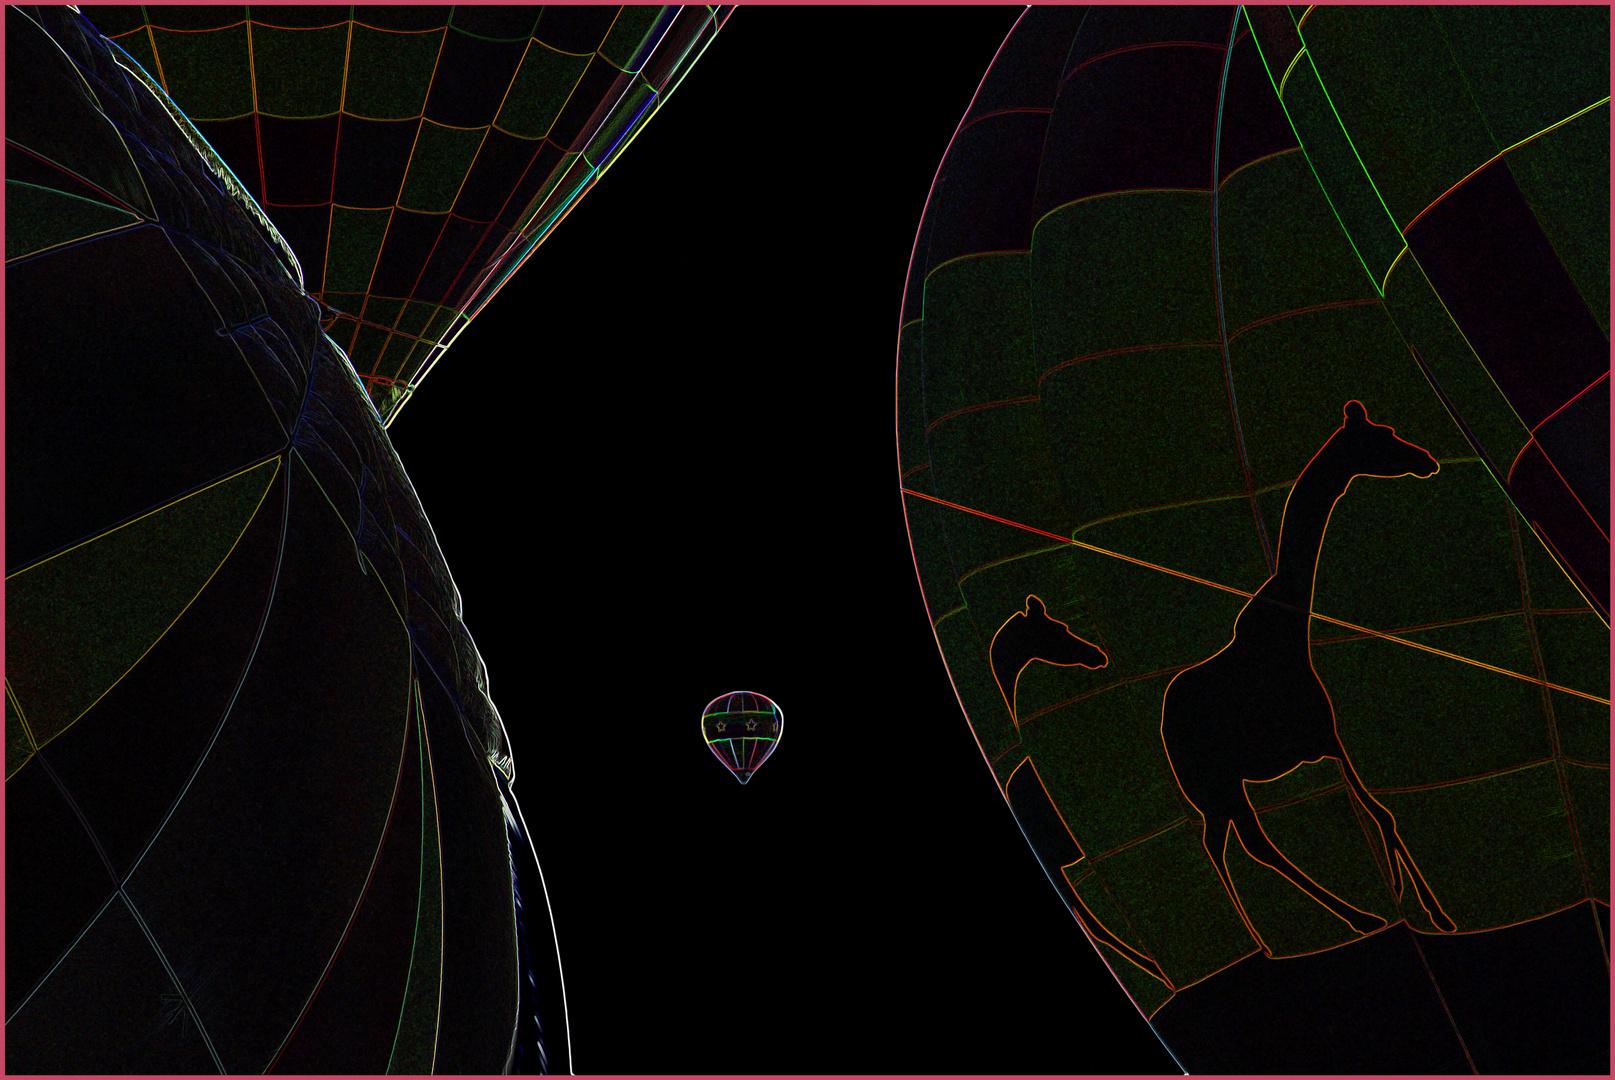 Hot Air Balloons, Stowe, Vt.,